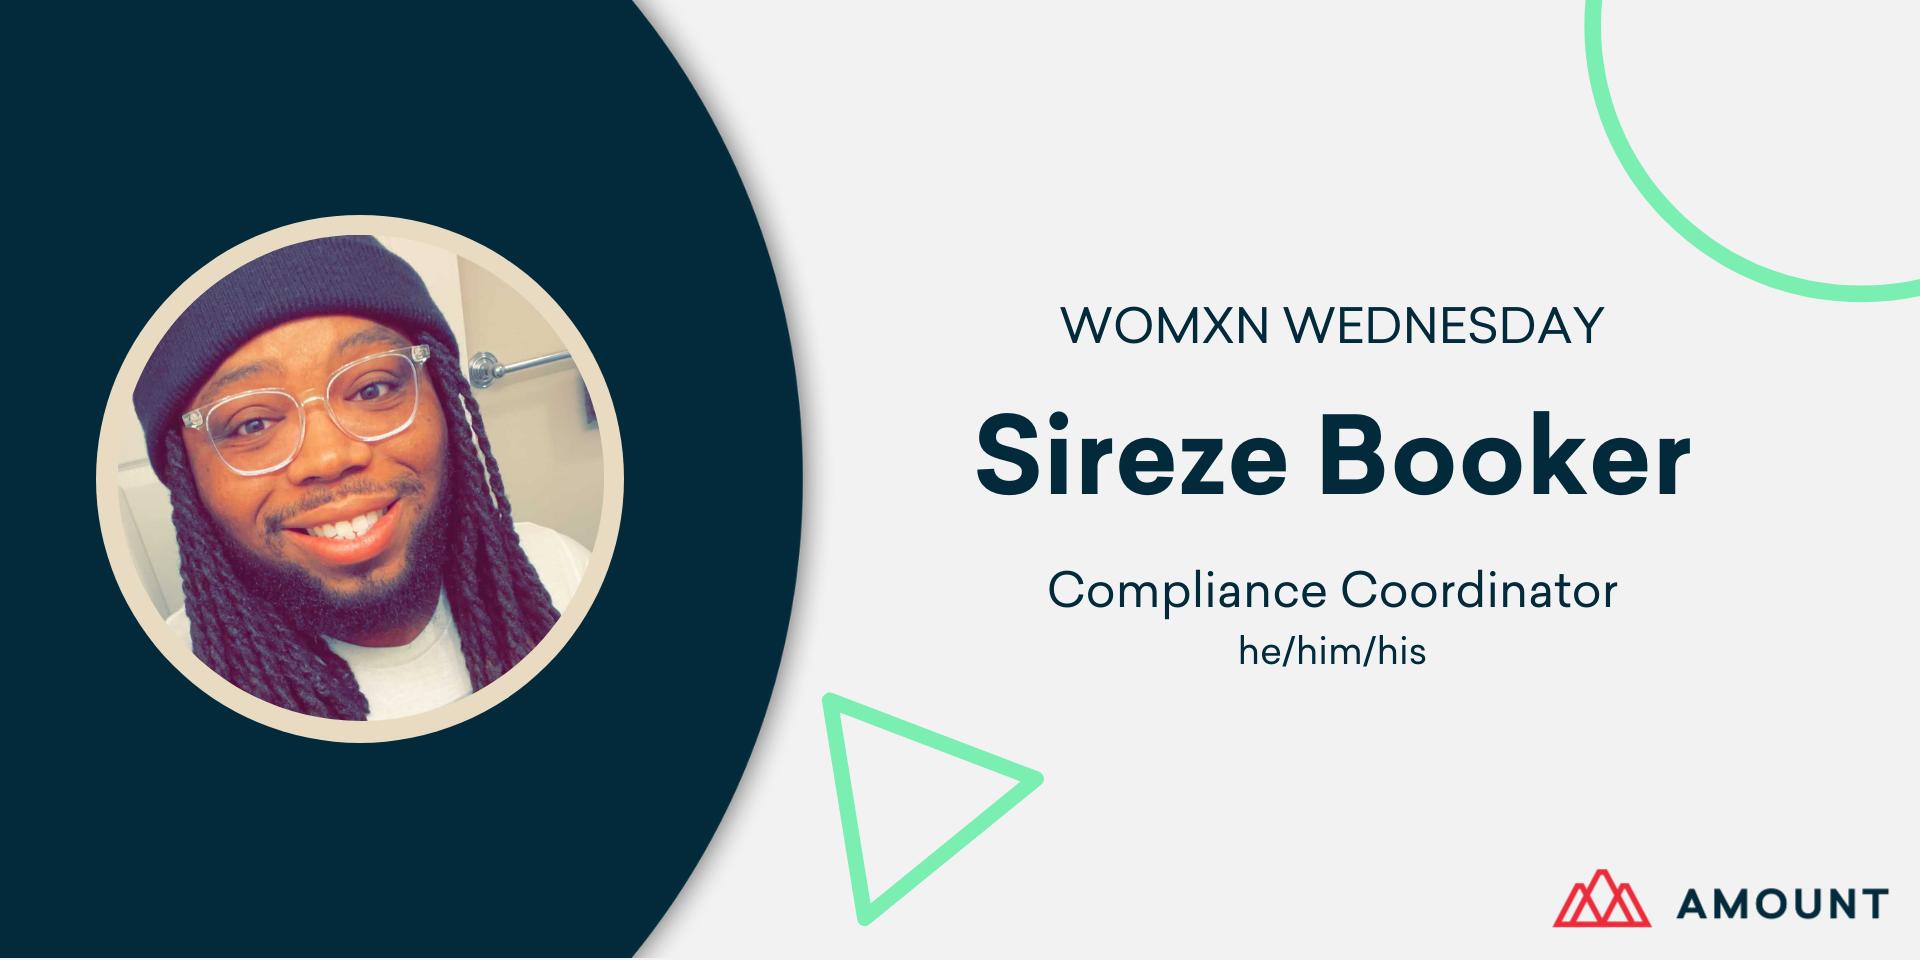 Sireze Booker - Womxn wednesday